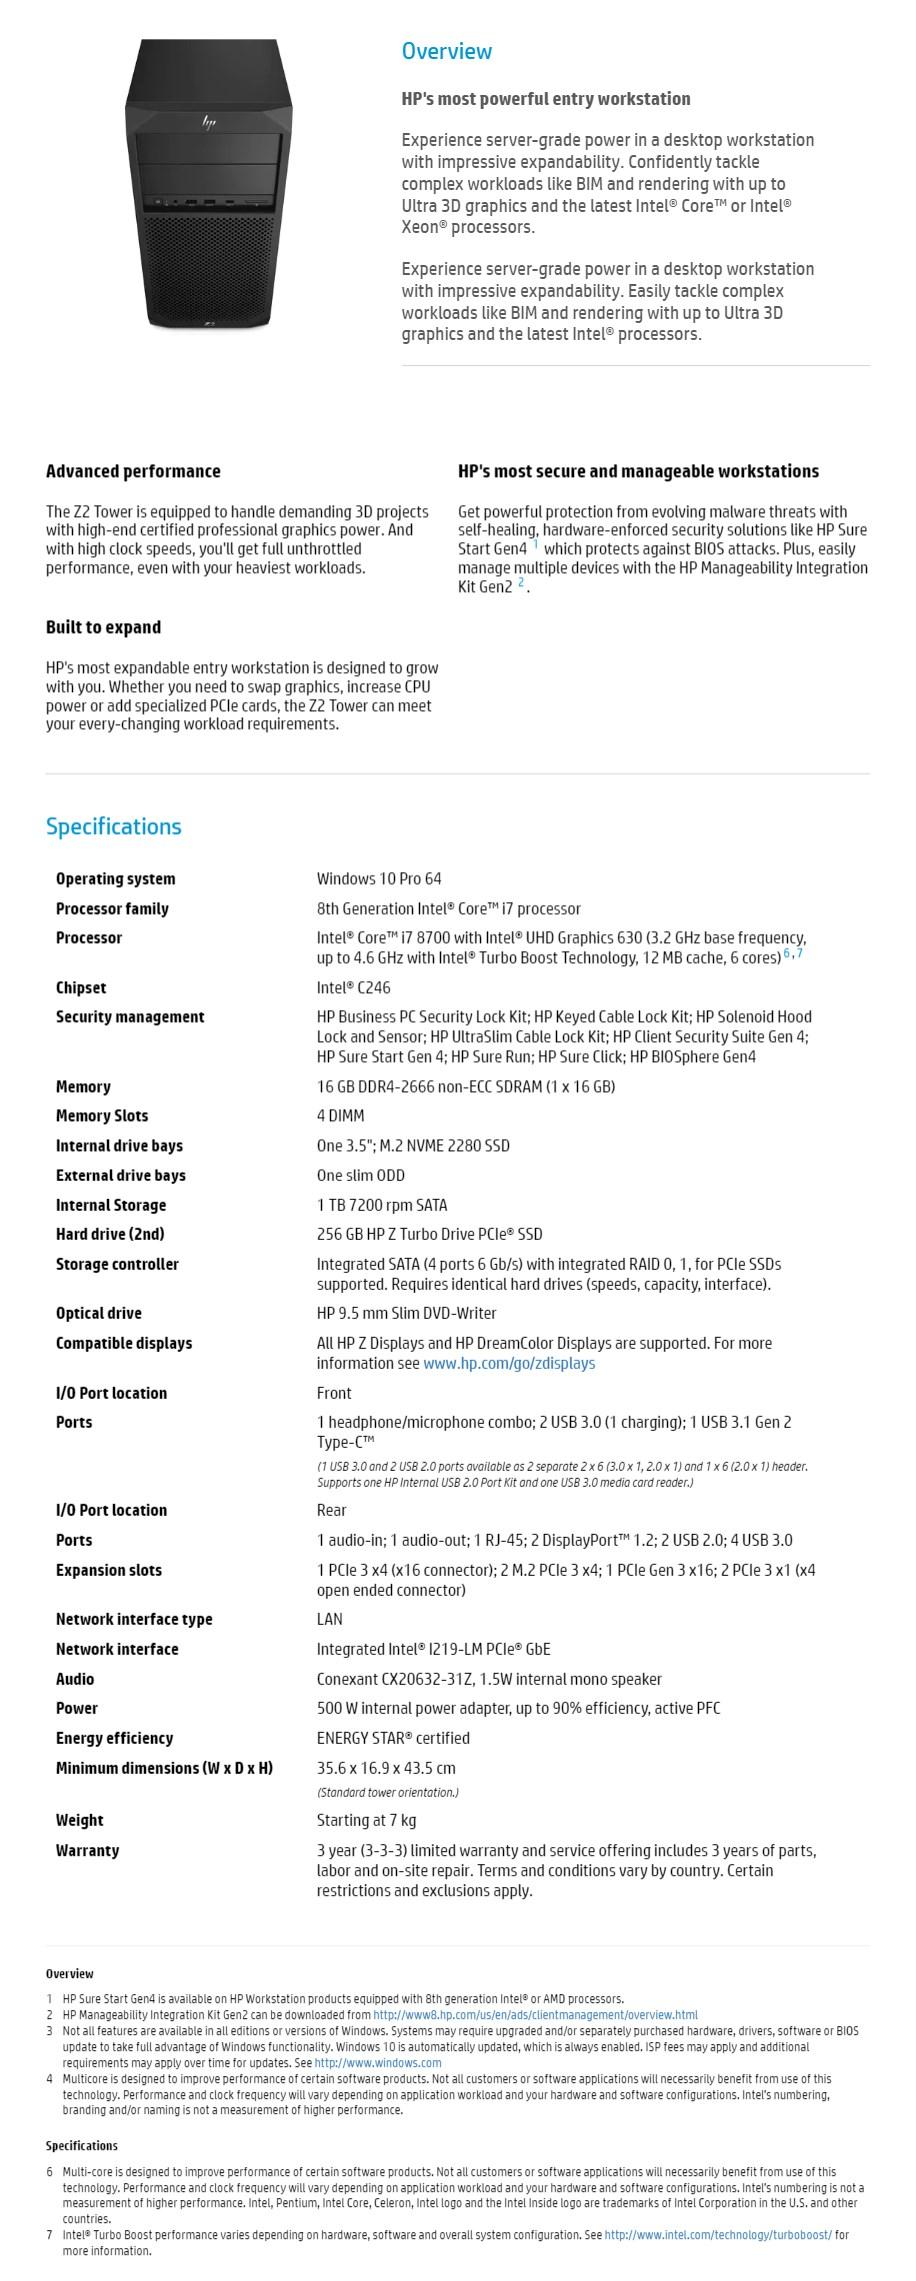 HP Z2 G4 Tower Desktop Workstation i7-8700 16GB 256GB+1TB P1000 Win10 Pro - Desktop Overview 1